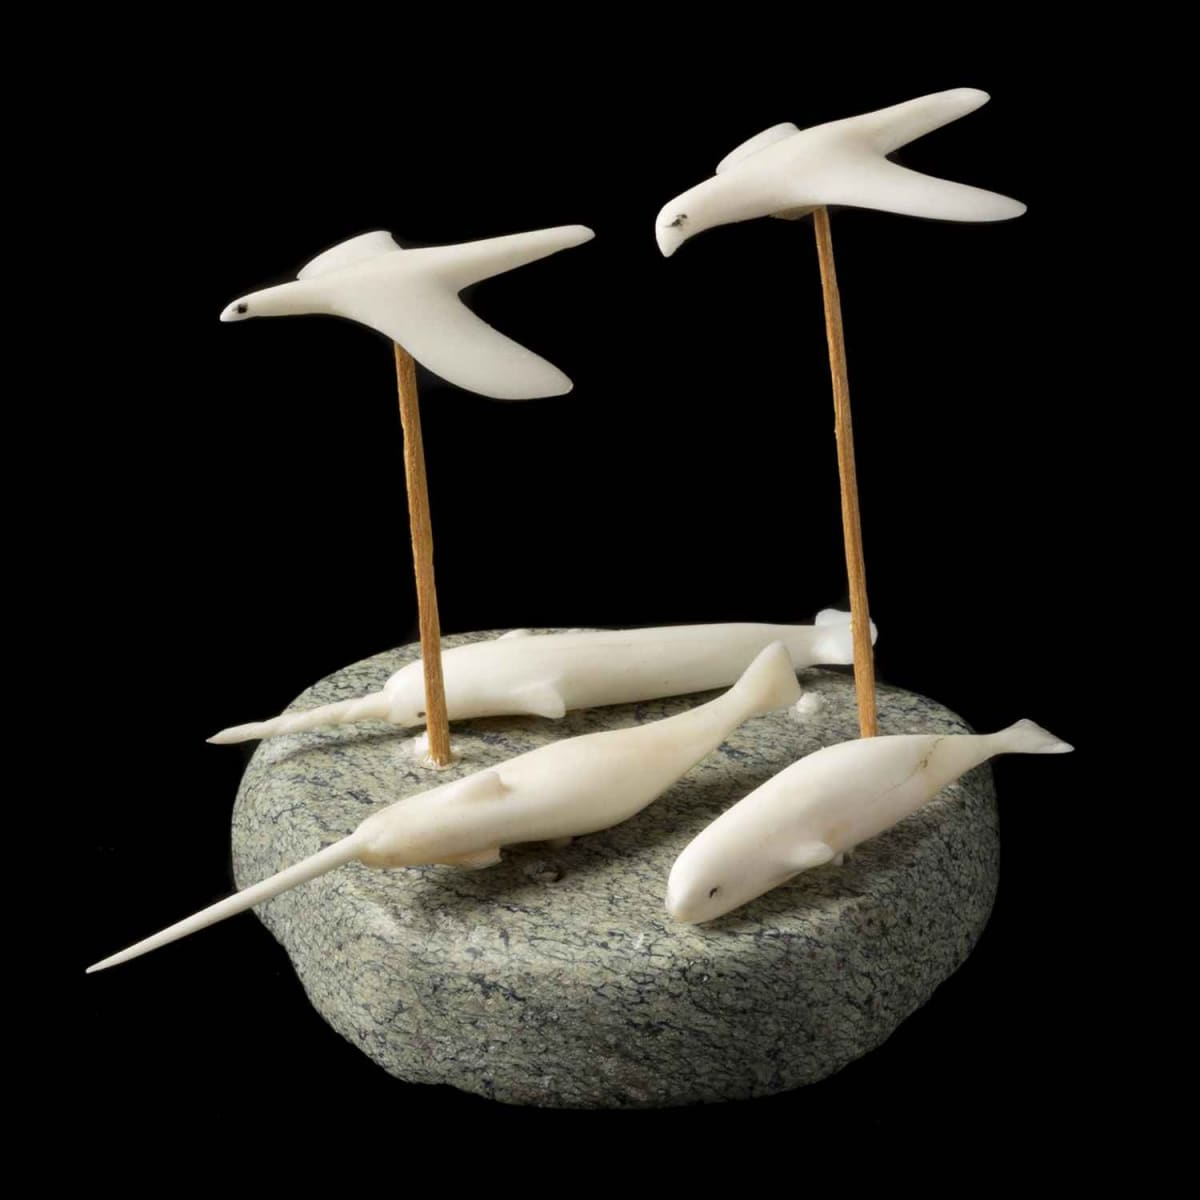 2. MARGUERITE ANERNERK KATOKRA (1934-), NAUJAAT (REPULSE BAY), Two Flying Birds, Two Narwhals and a Beluga, 1970